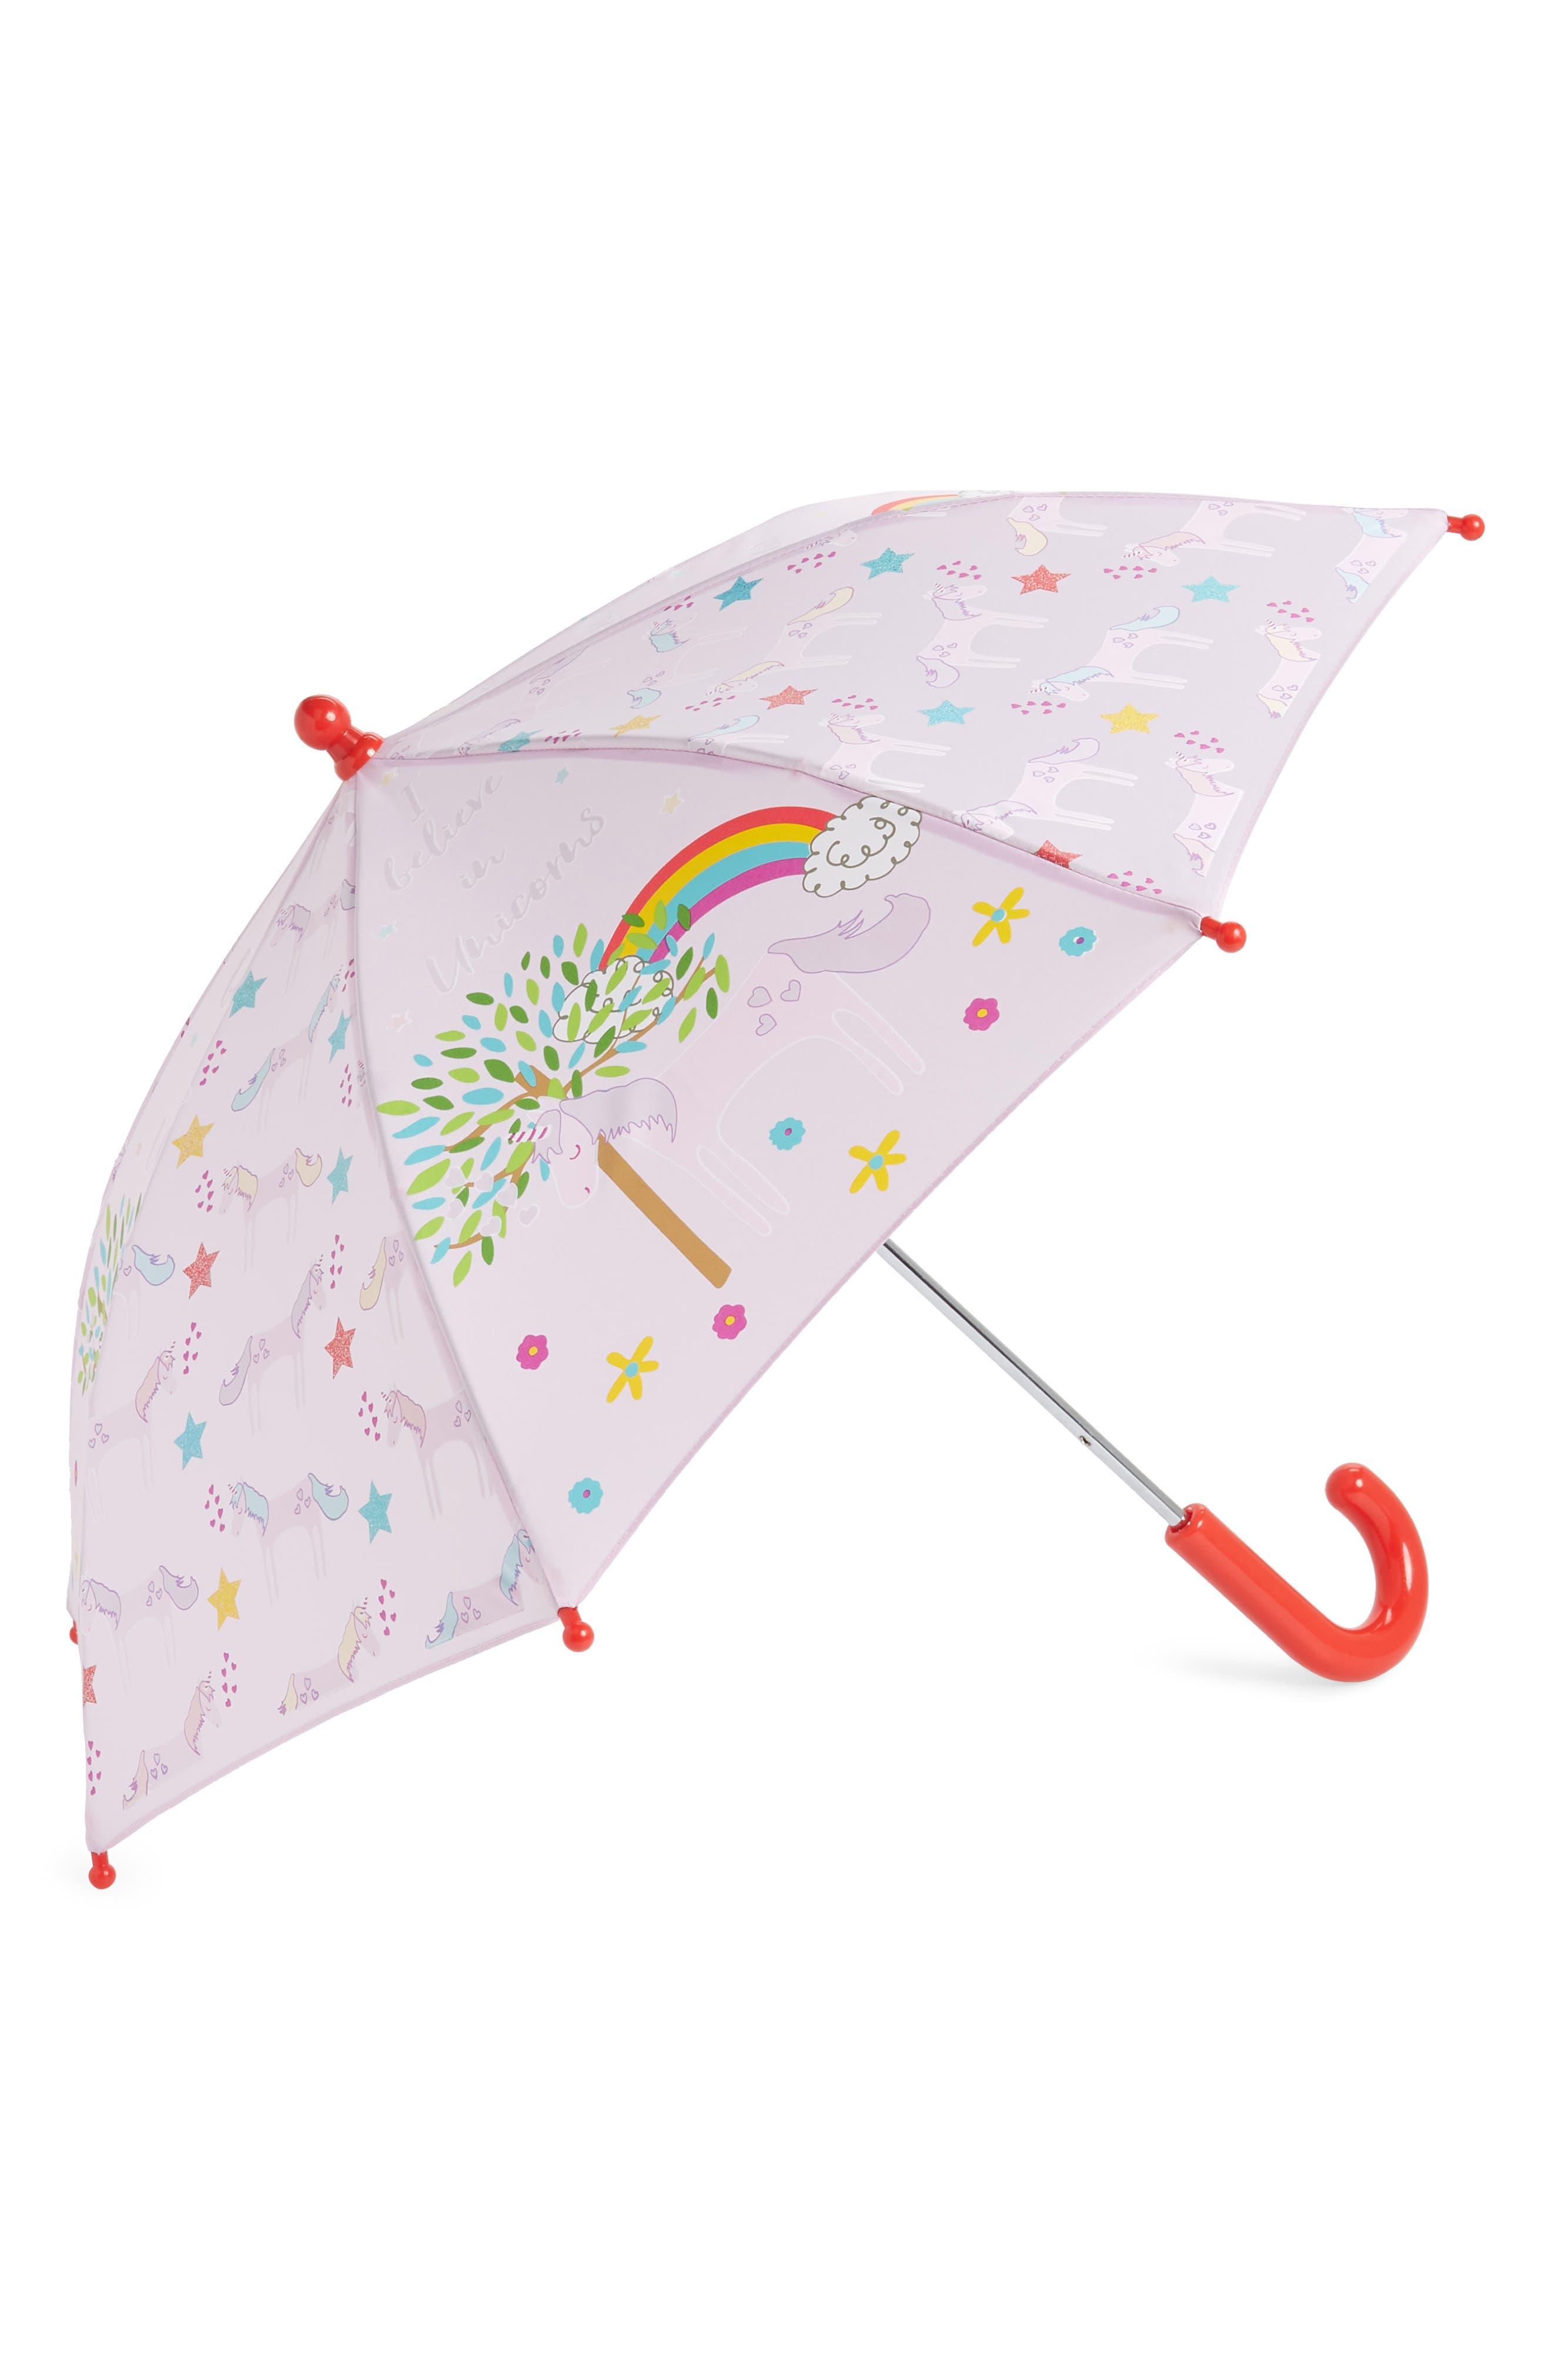 Floss & Rock Unicorn Color Changing Umbrella,                             Main thumbnail 1, color,                             LIGHT PINK